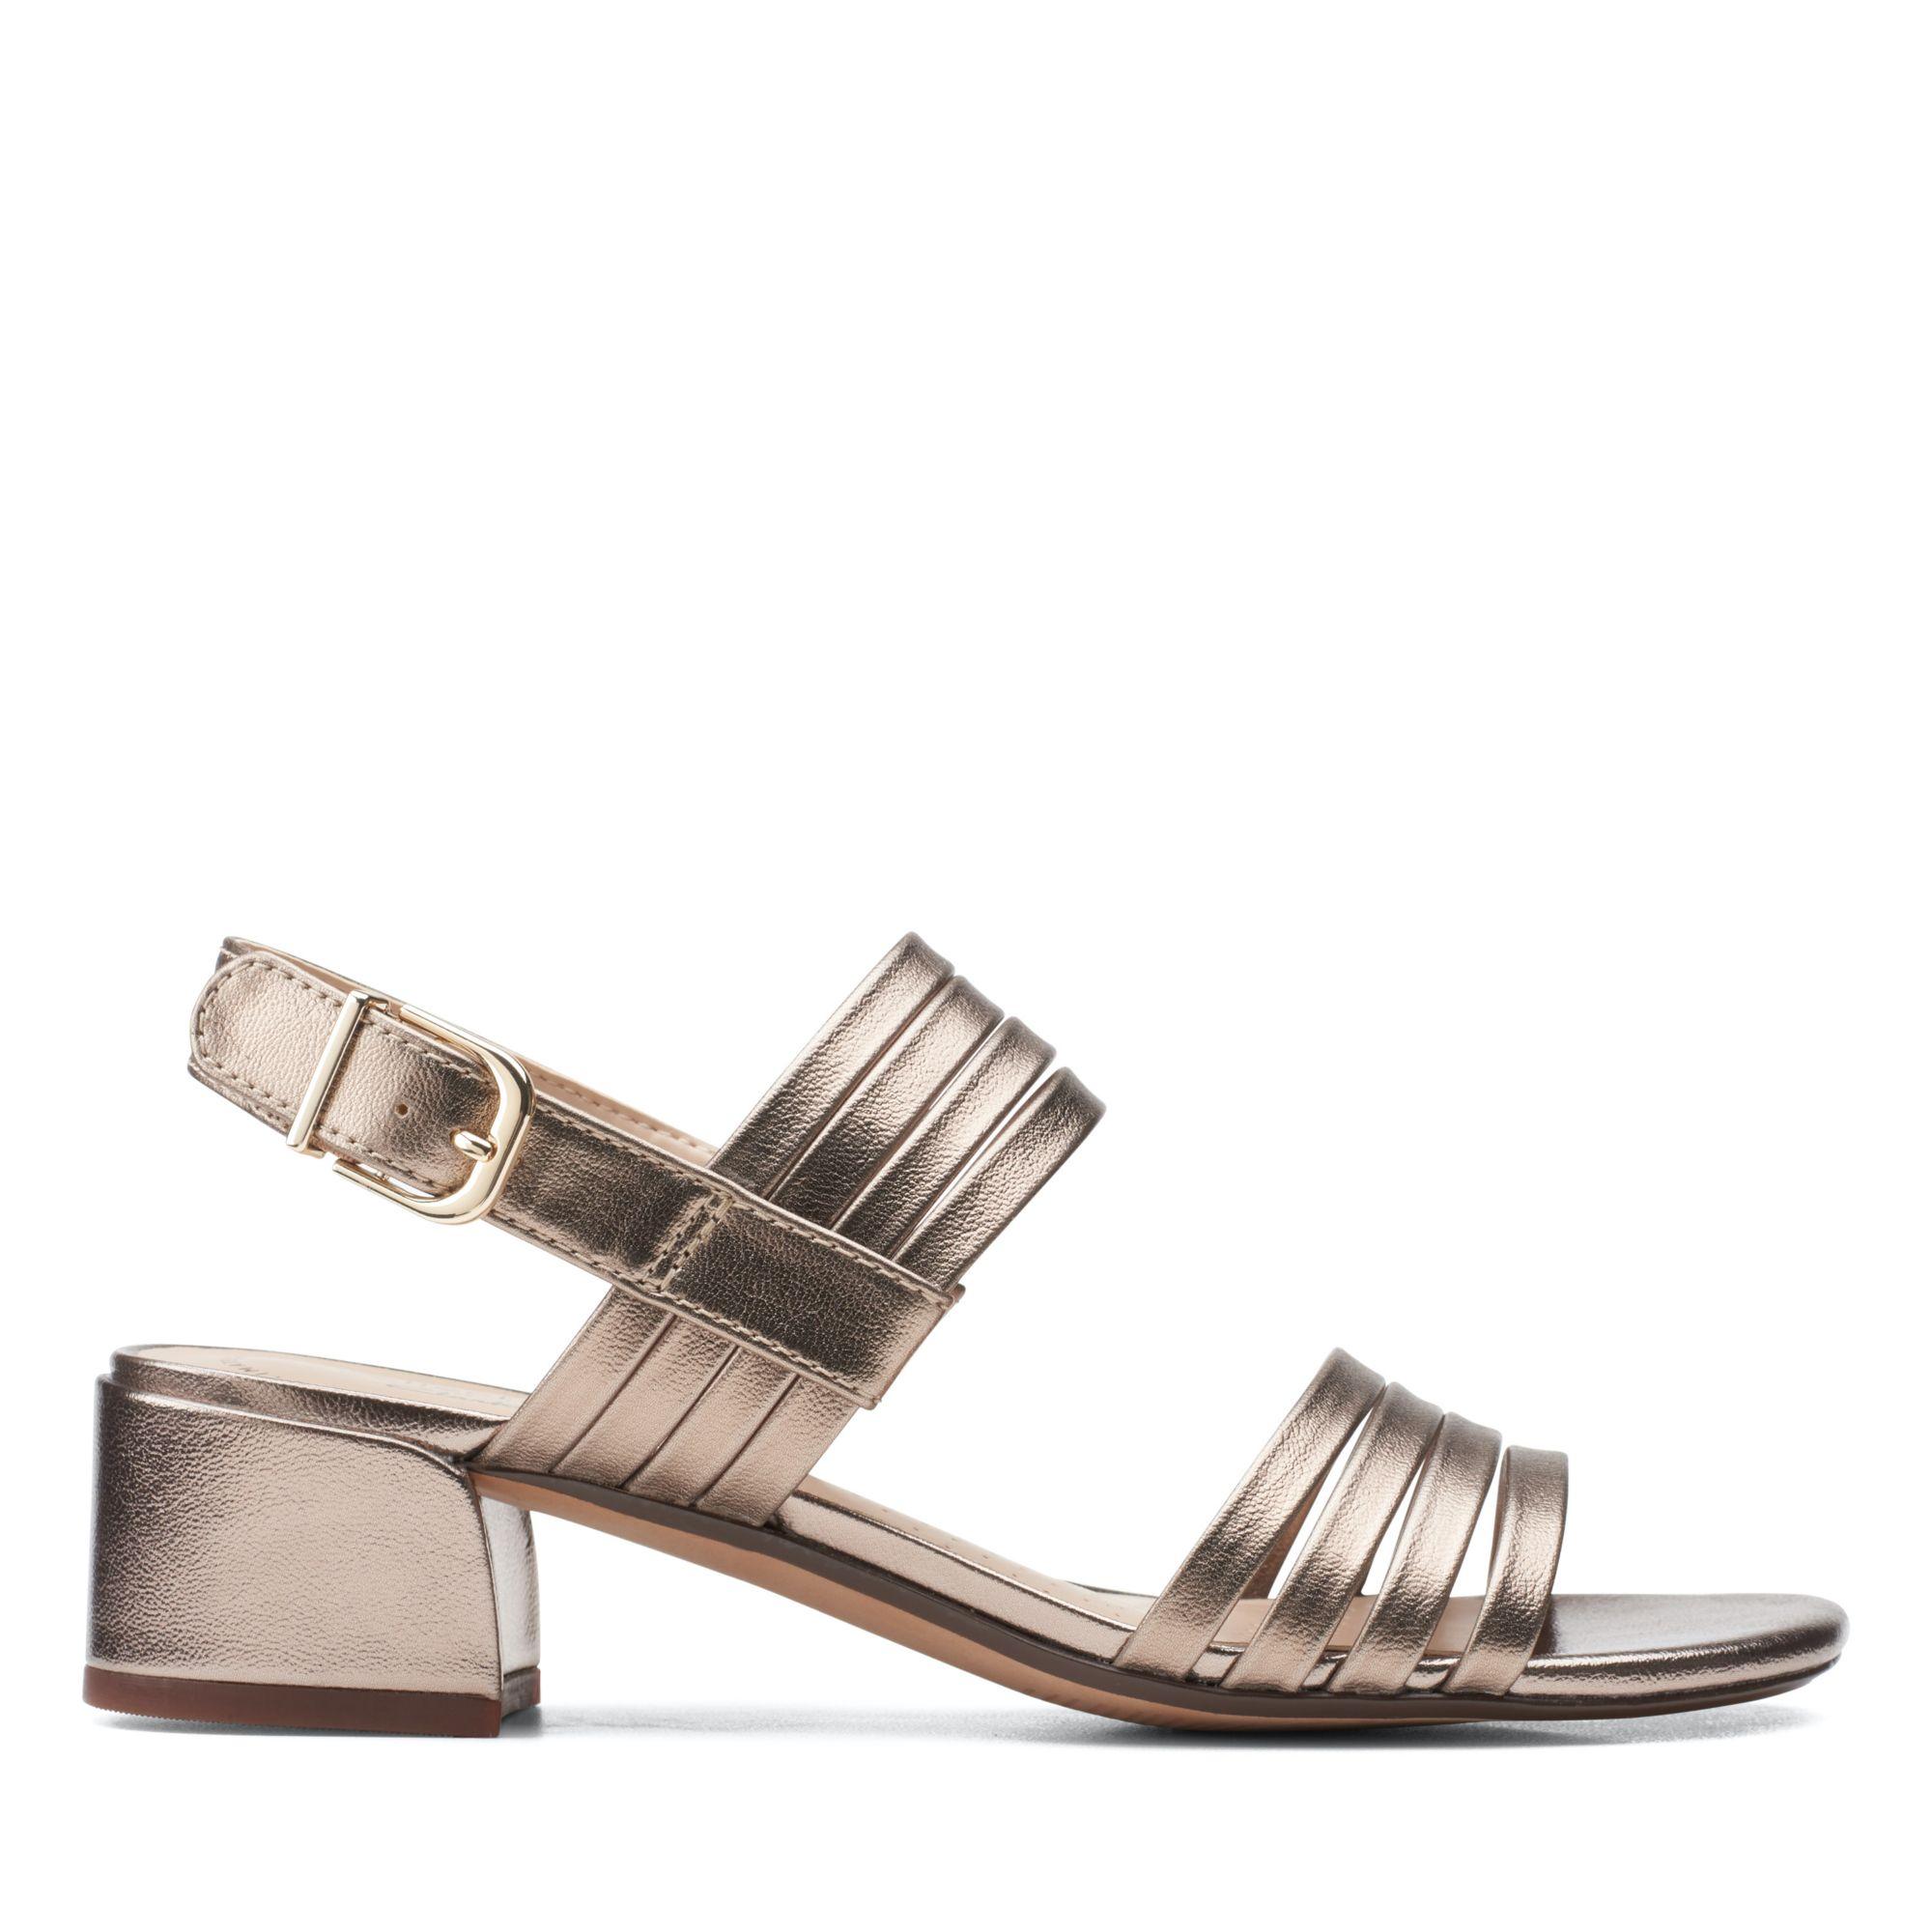 Clarks仲夏之夢-Caroleigh Bess 雙色細帶方跟涼鞋(金屬色)